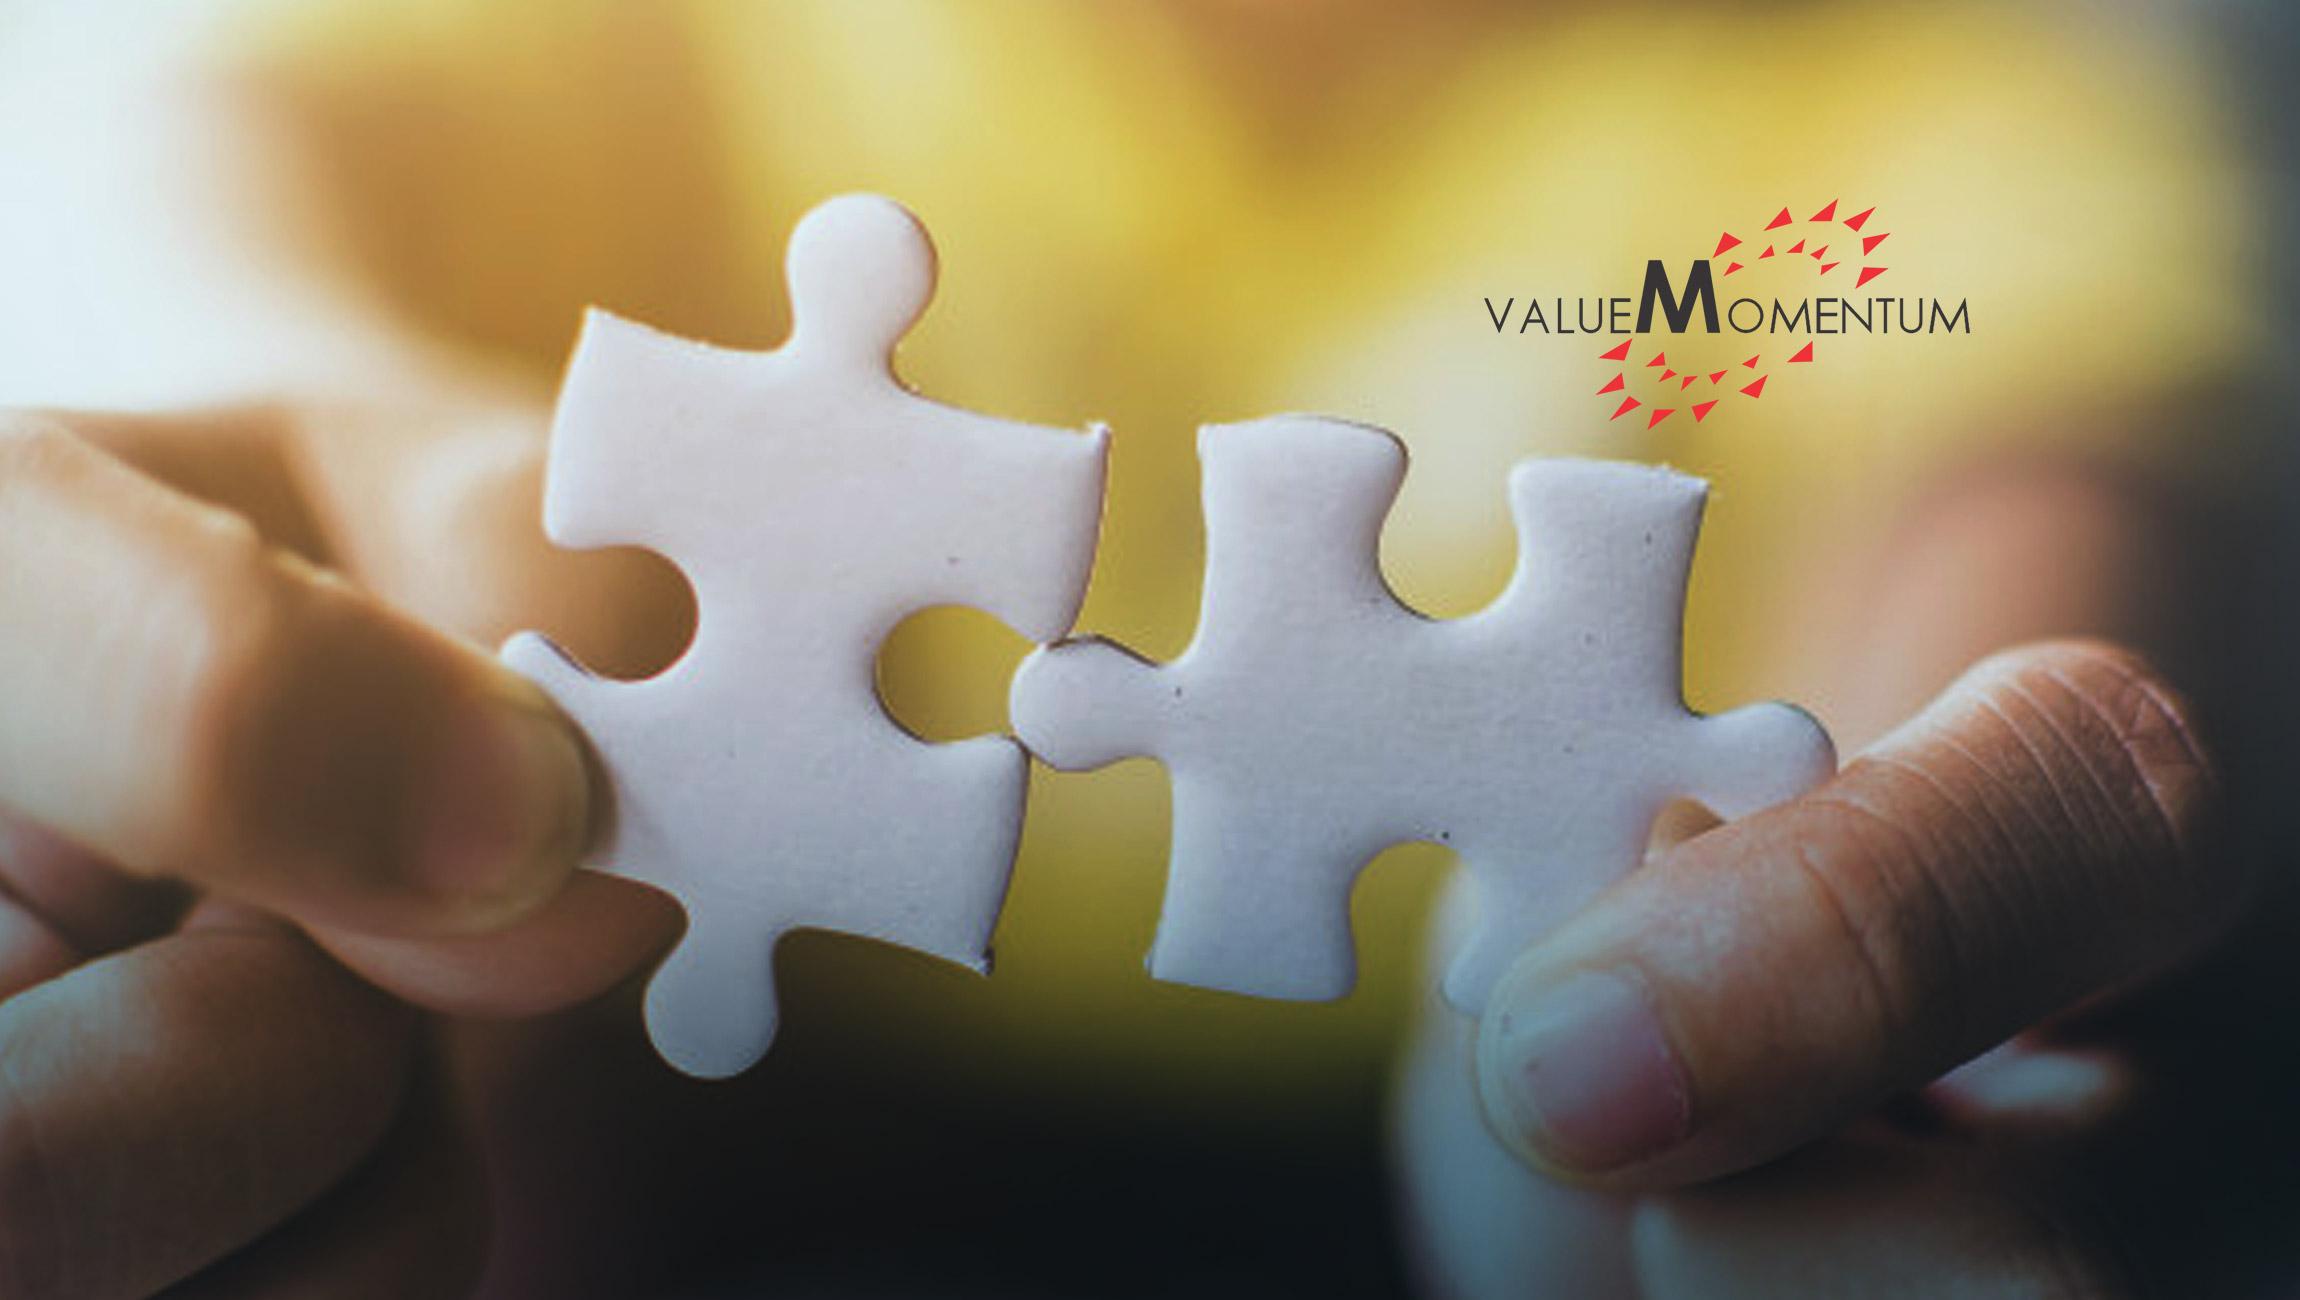 ValueMomentum Joins the MuleSoft Partner Program